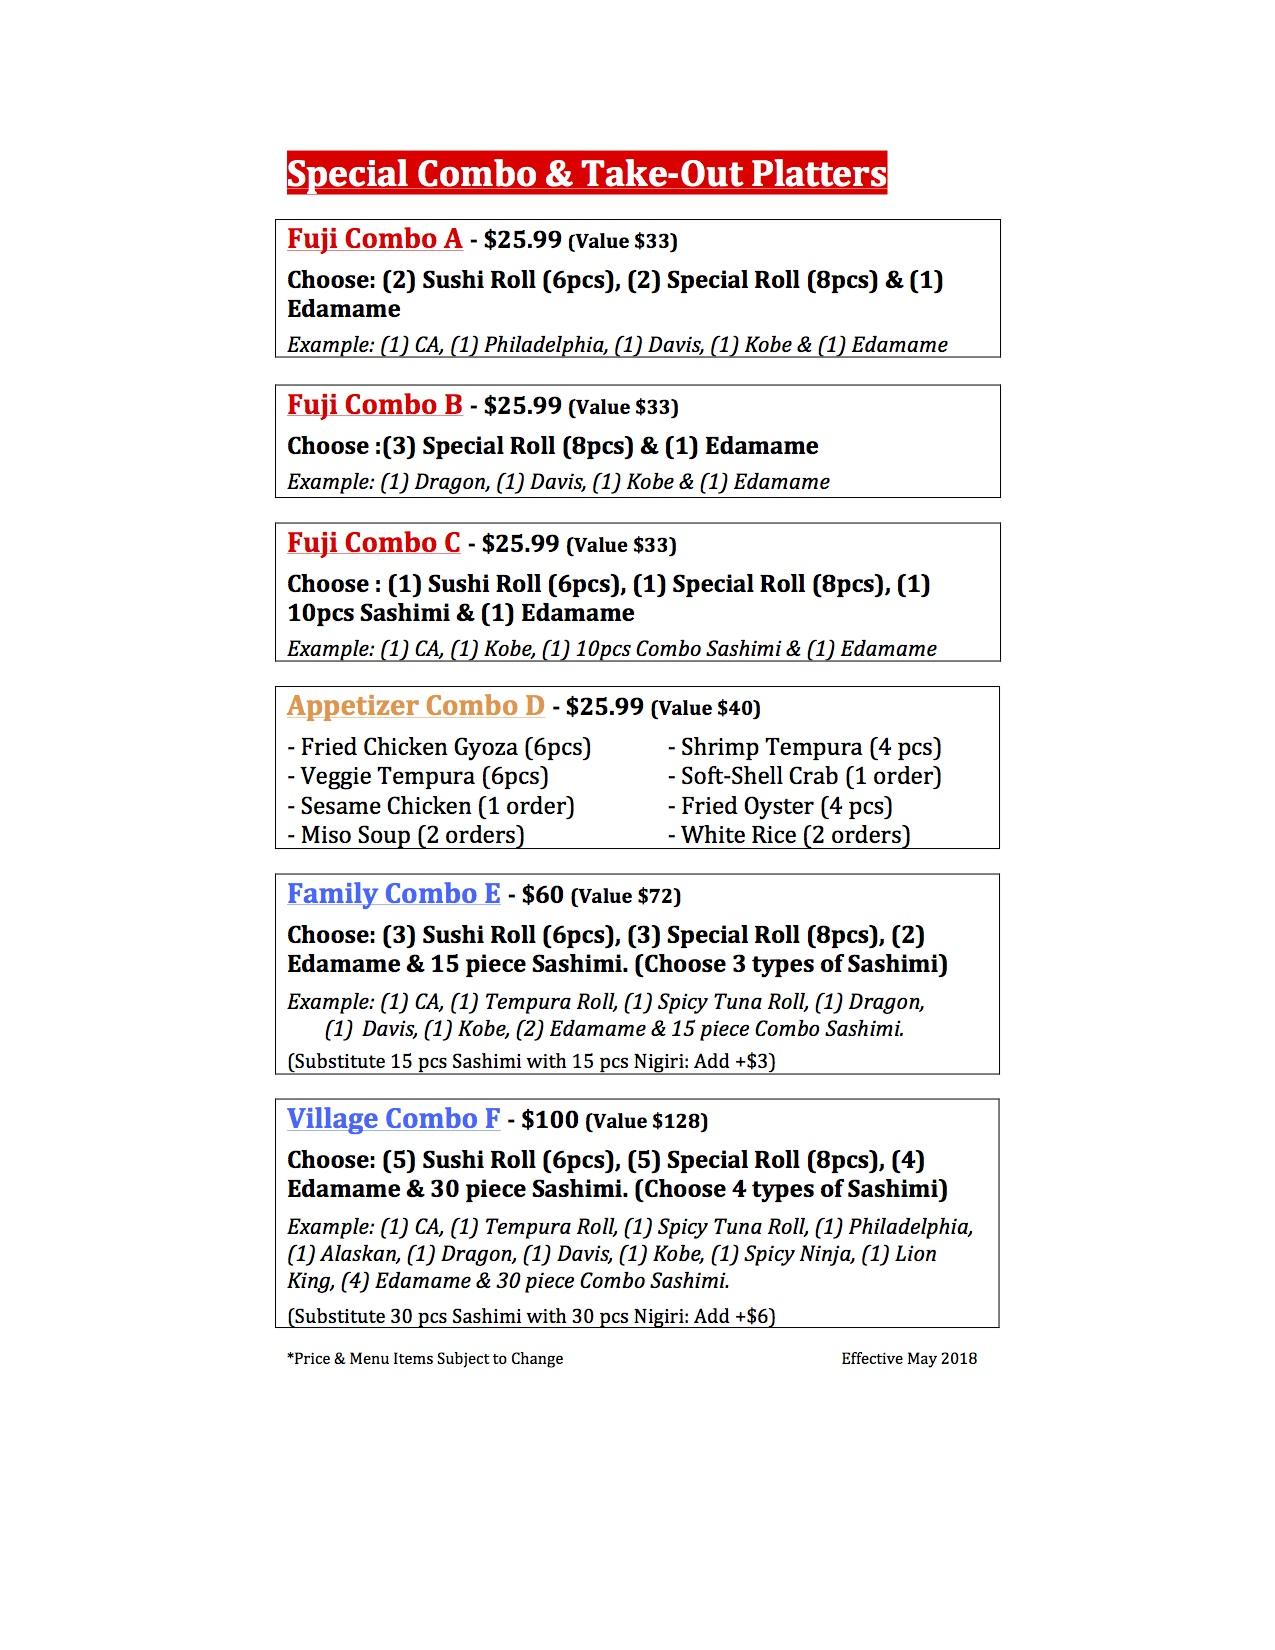 Microsoft Word - Special Combo Party Platter Menu 5.18.jpg